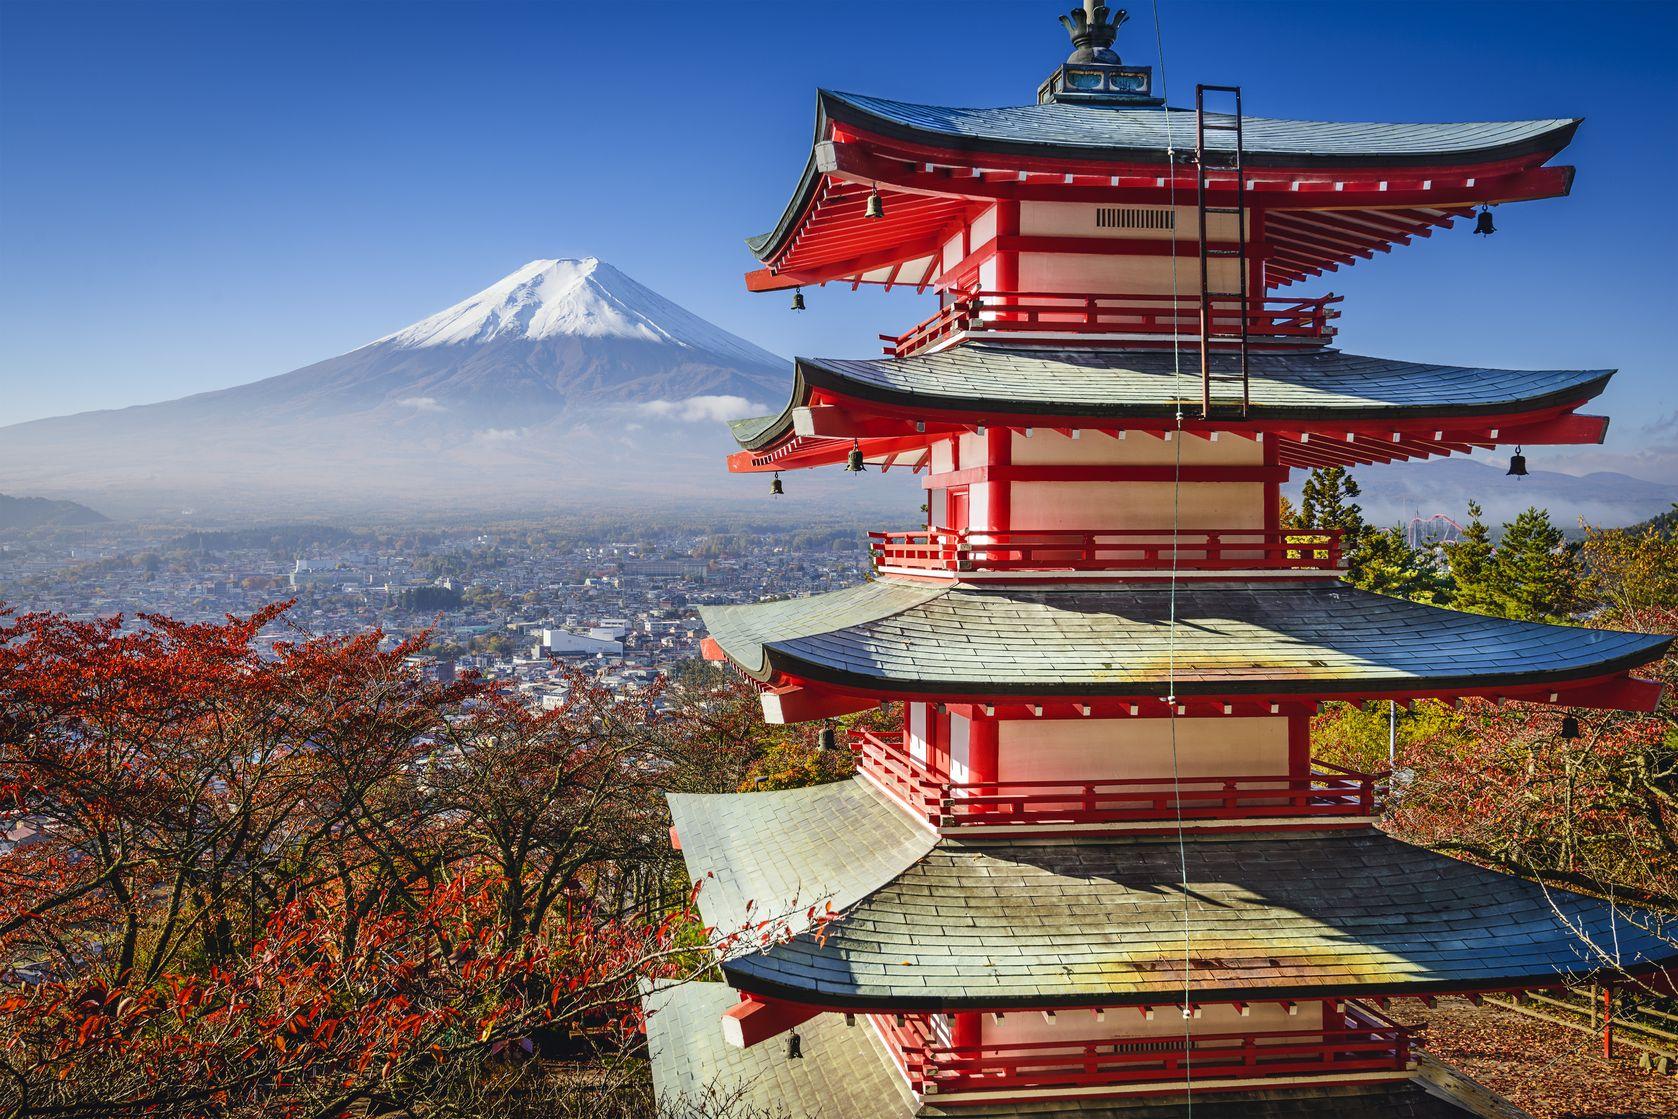 Full beyond a pagoda